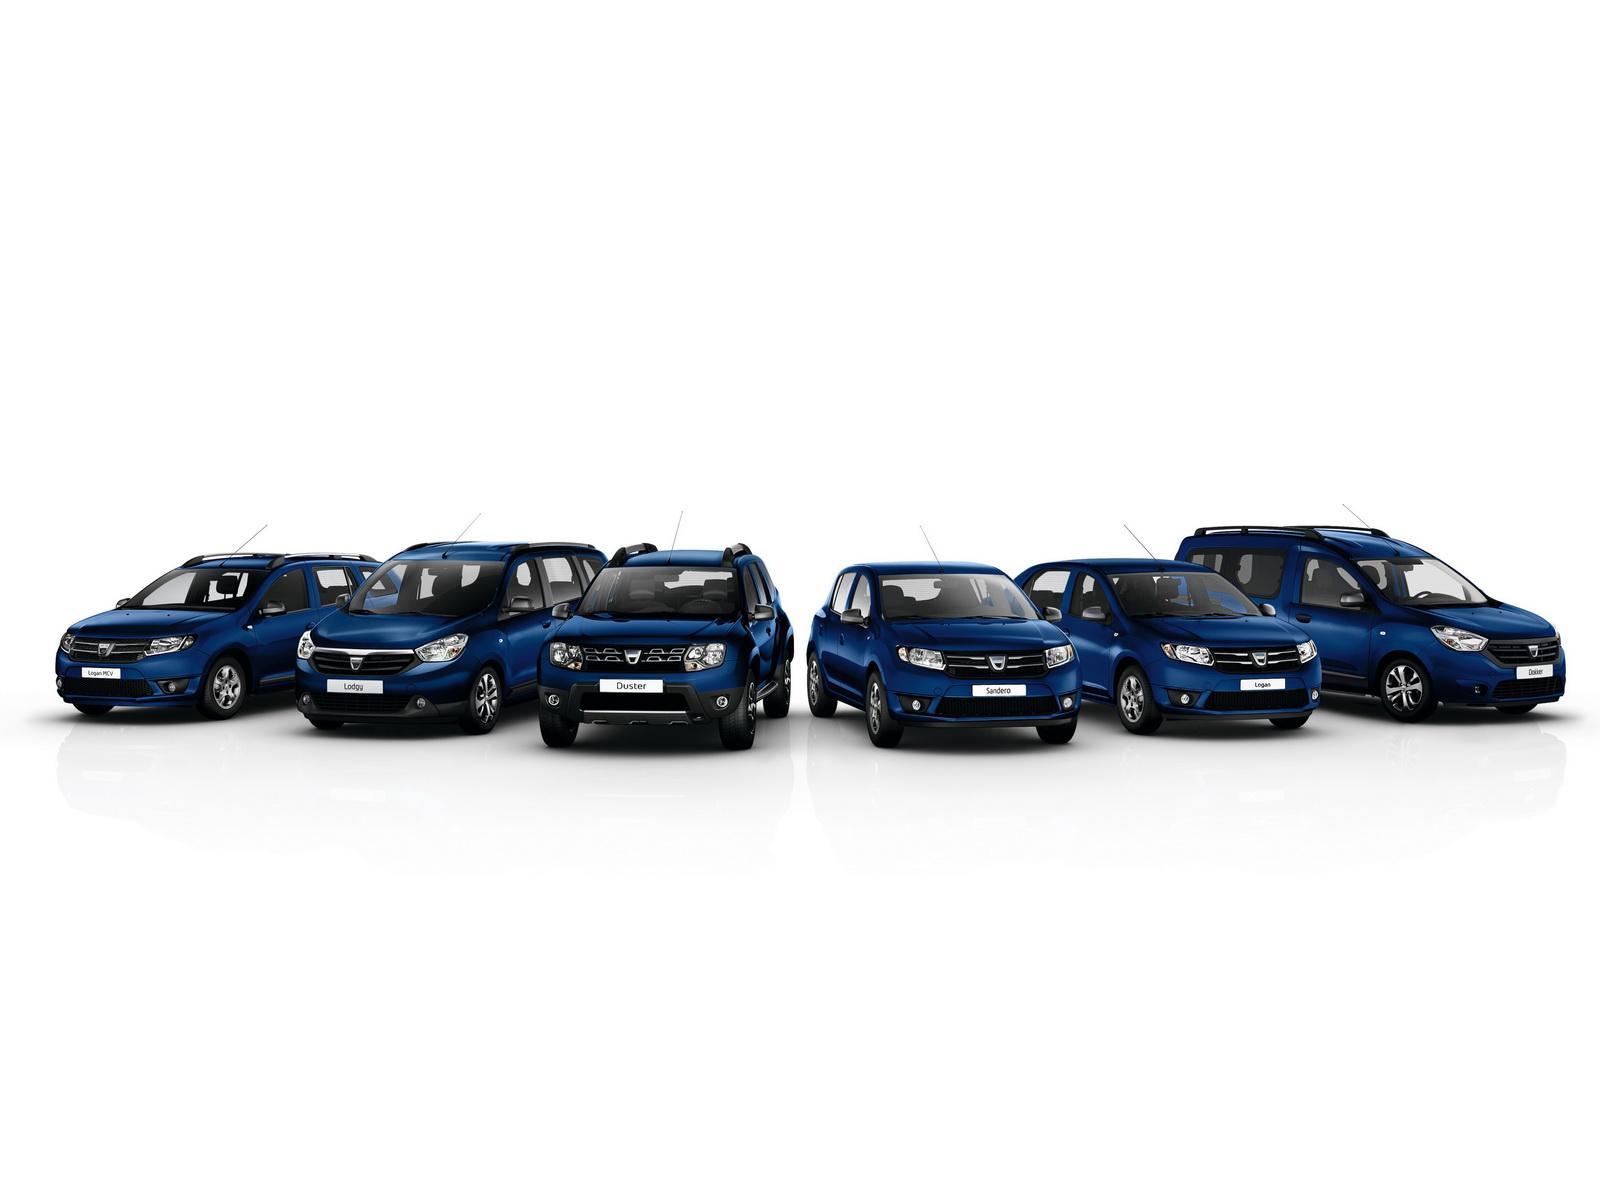 Dacia Anniversary Limited Edition